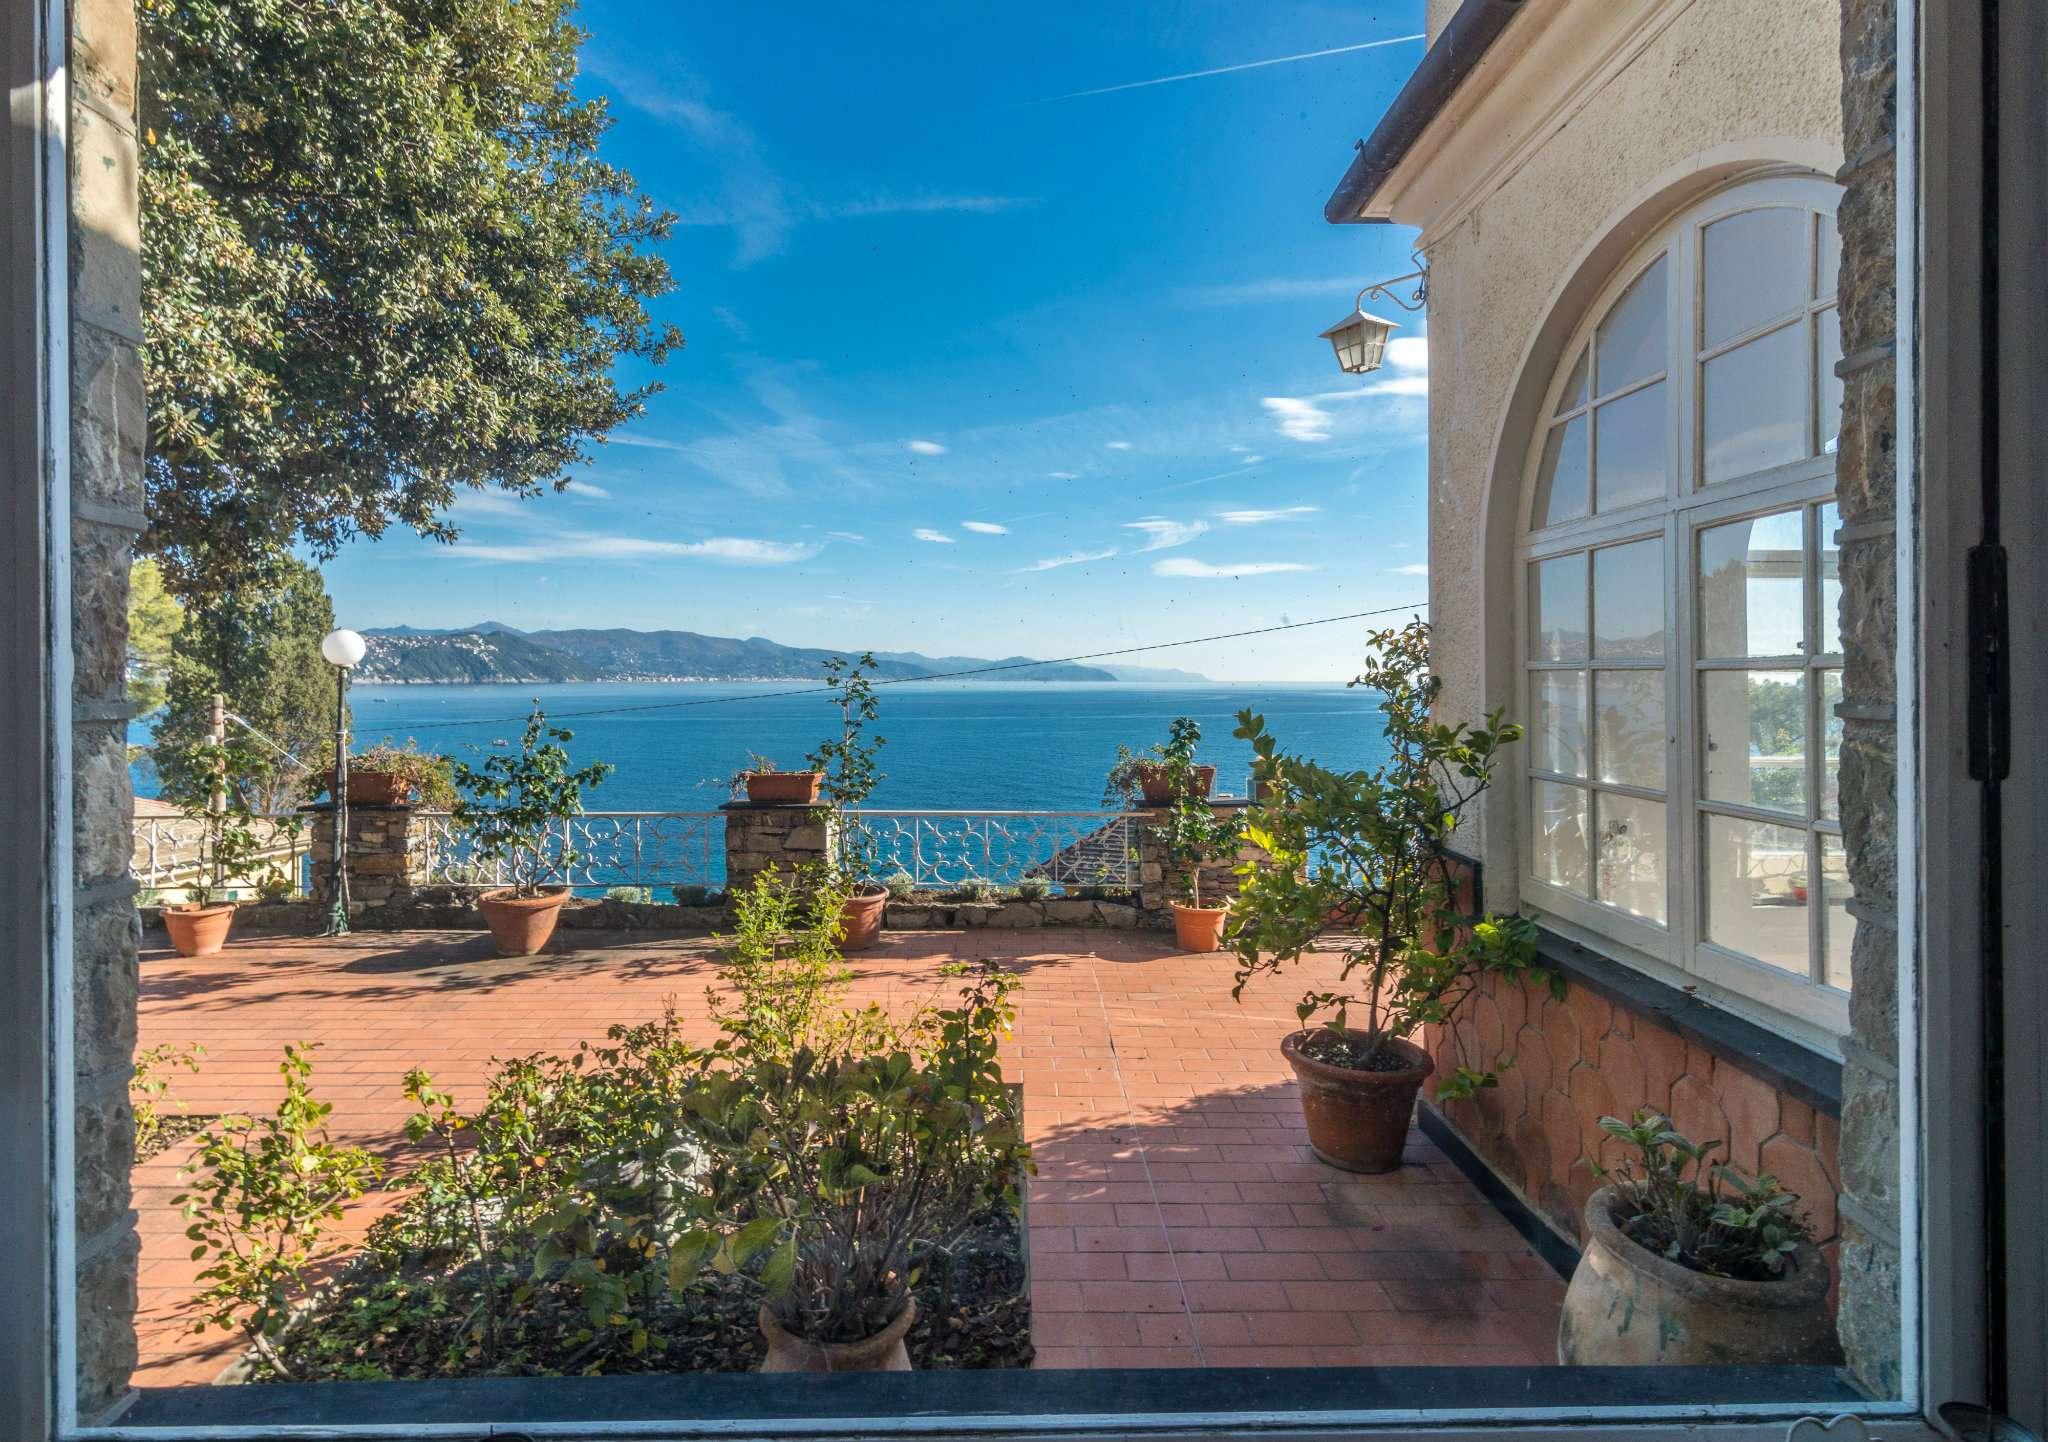 Villa in Vendita a Santa Margherita Ligure: 5 locali, 545 mq - Foto 5